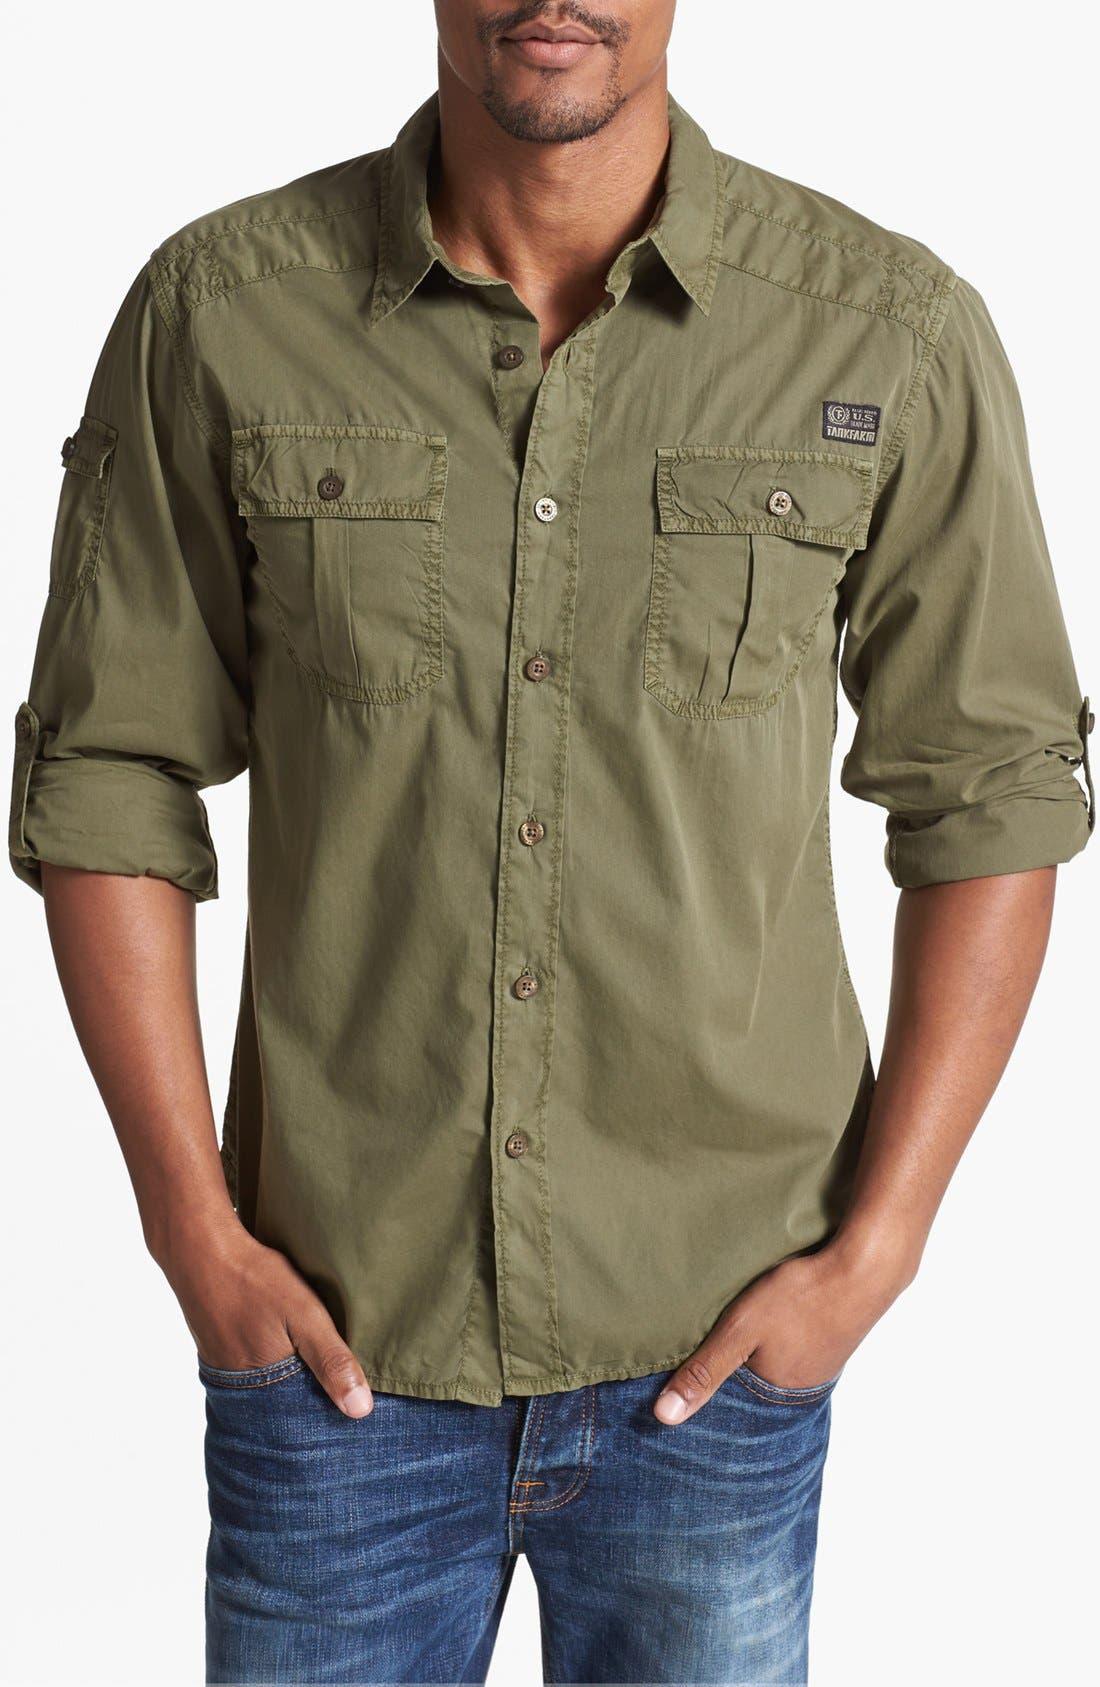 Alternate Image 1 Selected - Tankfarm 'Deploy' Woven Shirt